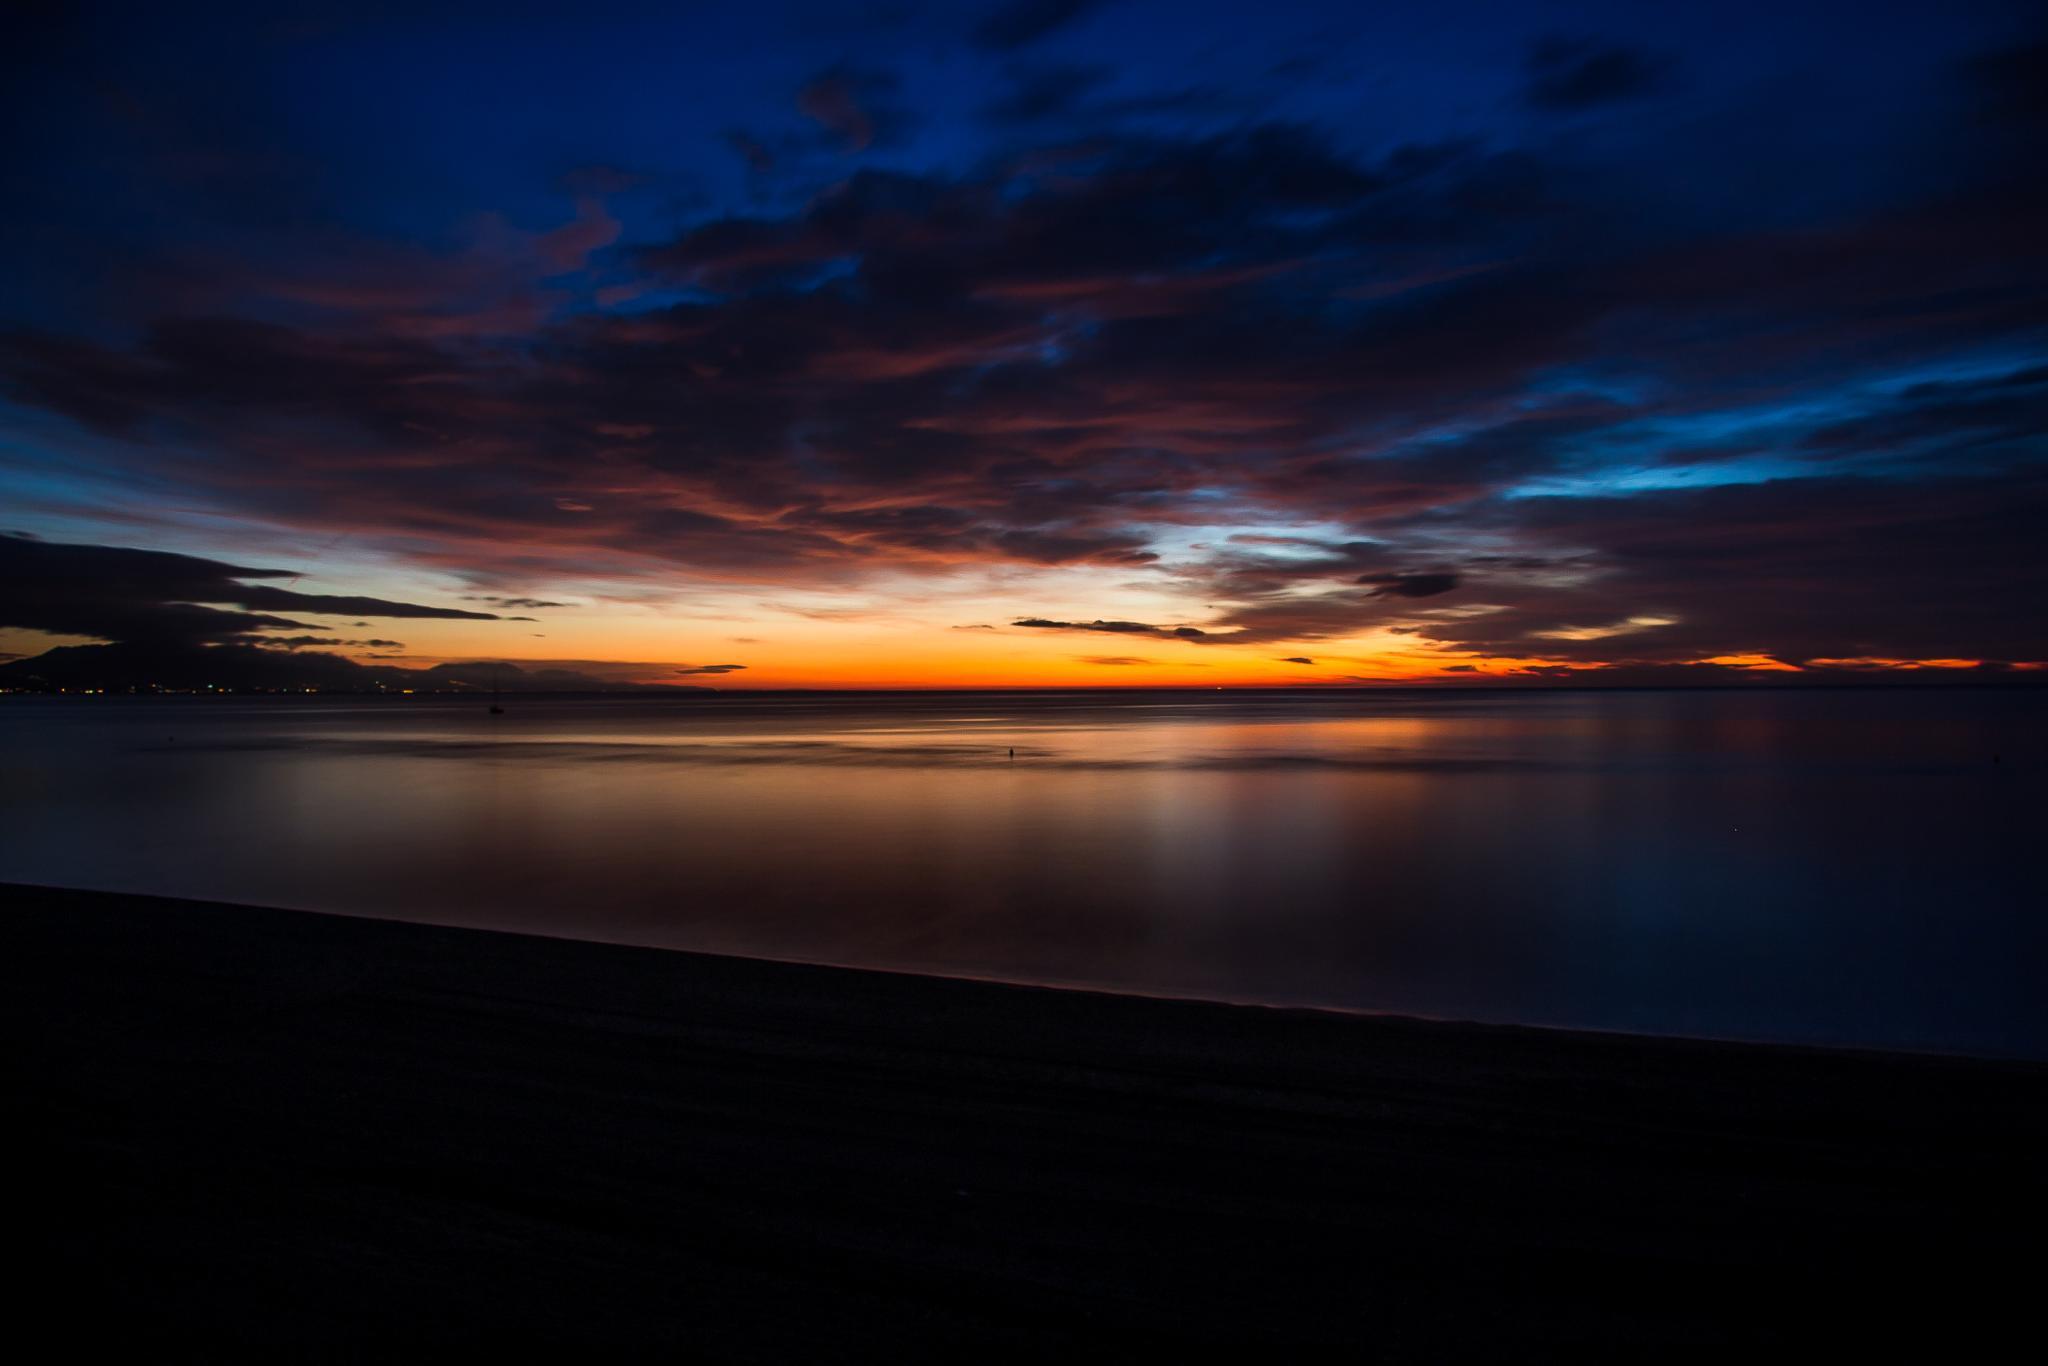 Sunrise at Manilva by stephenhops